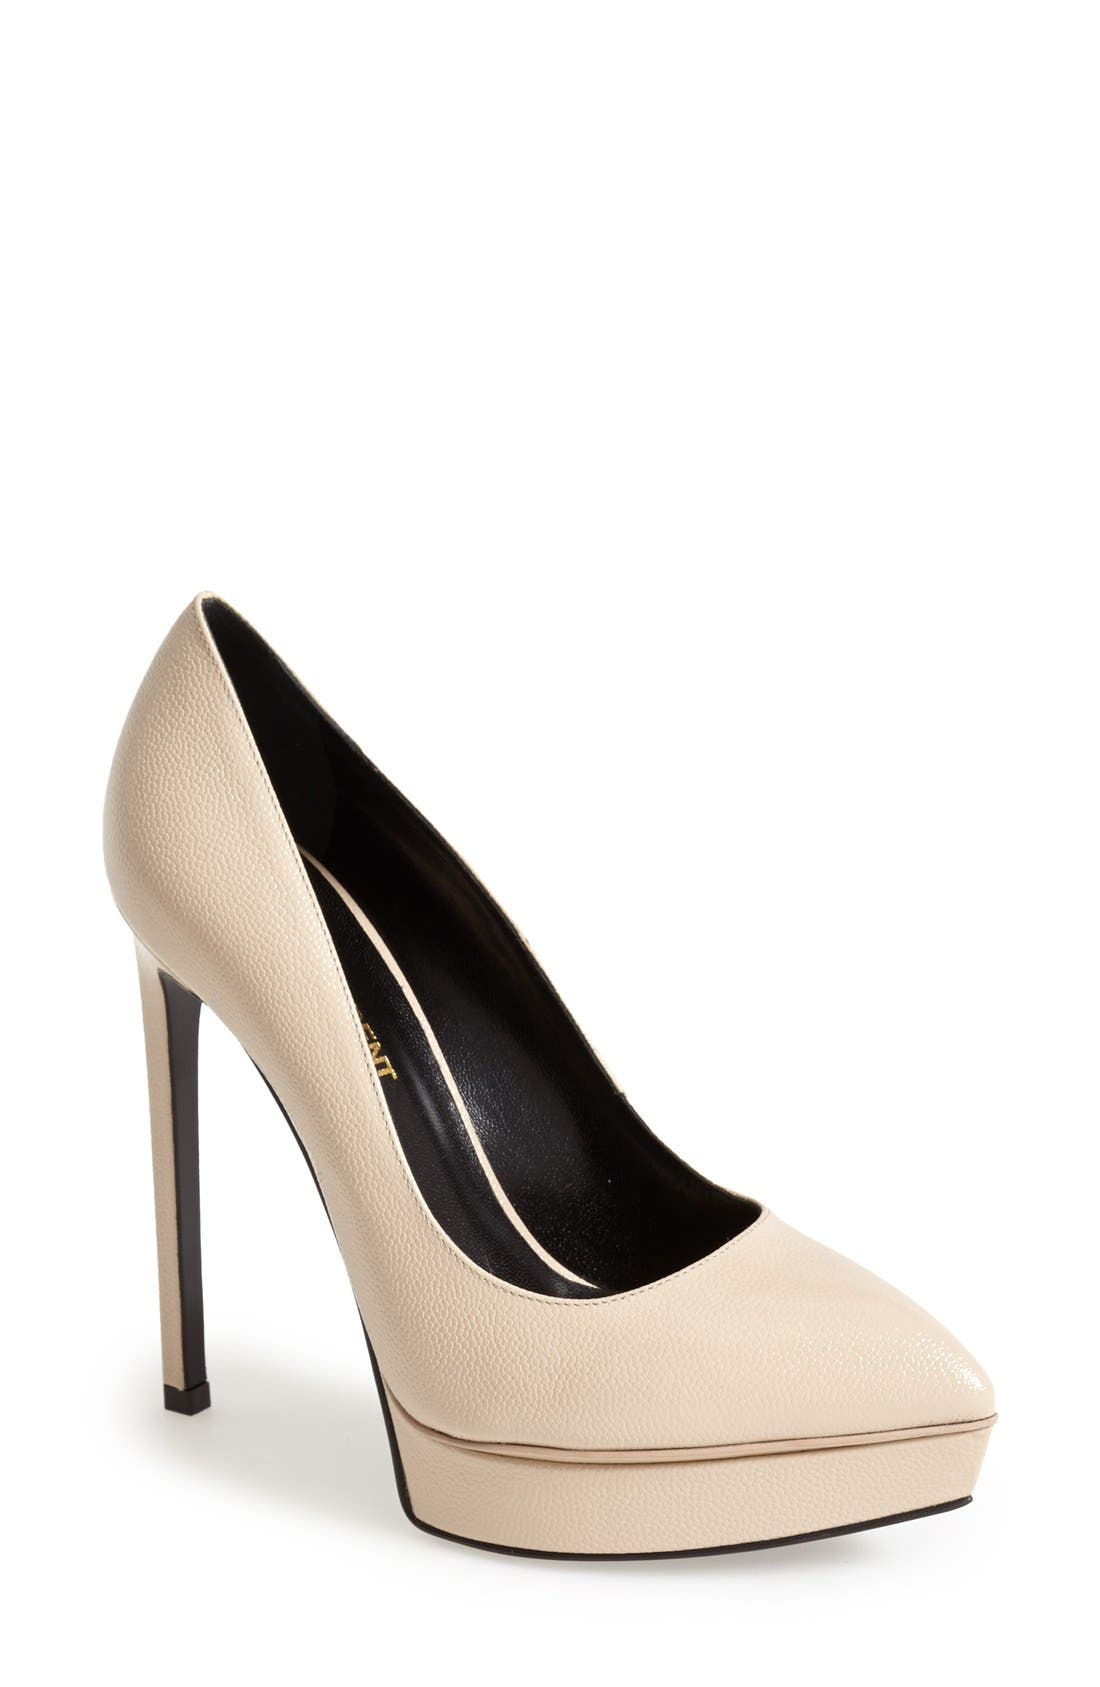 Alternate Image 1 Selected - Saint Laurent 'Janis' Pointy Toe Platform Pump (Women)